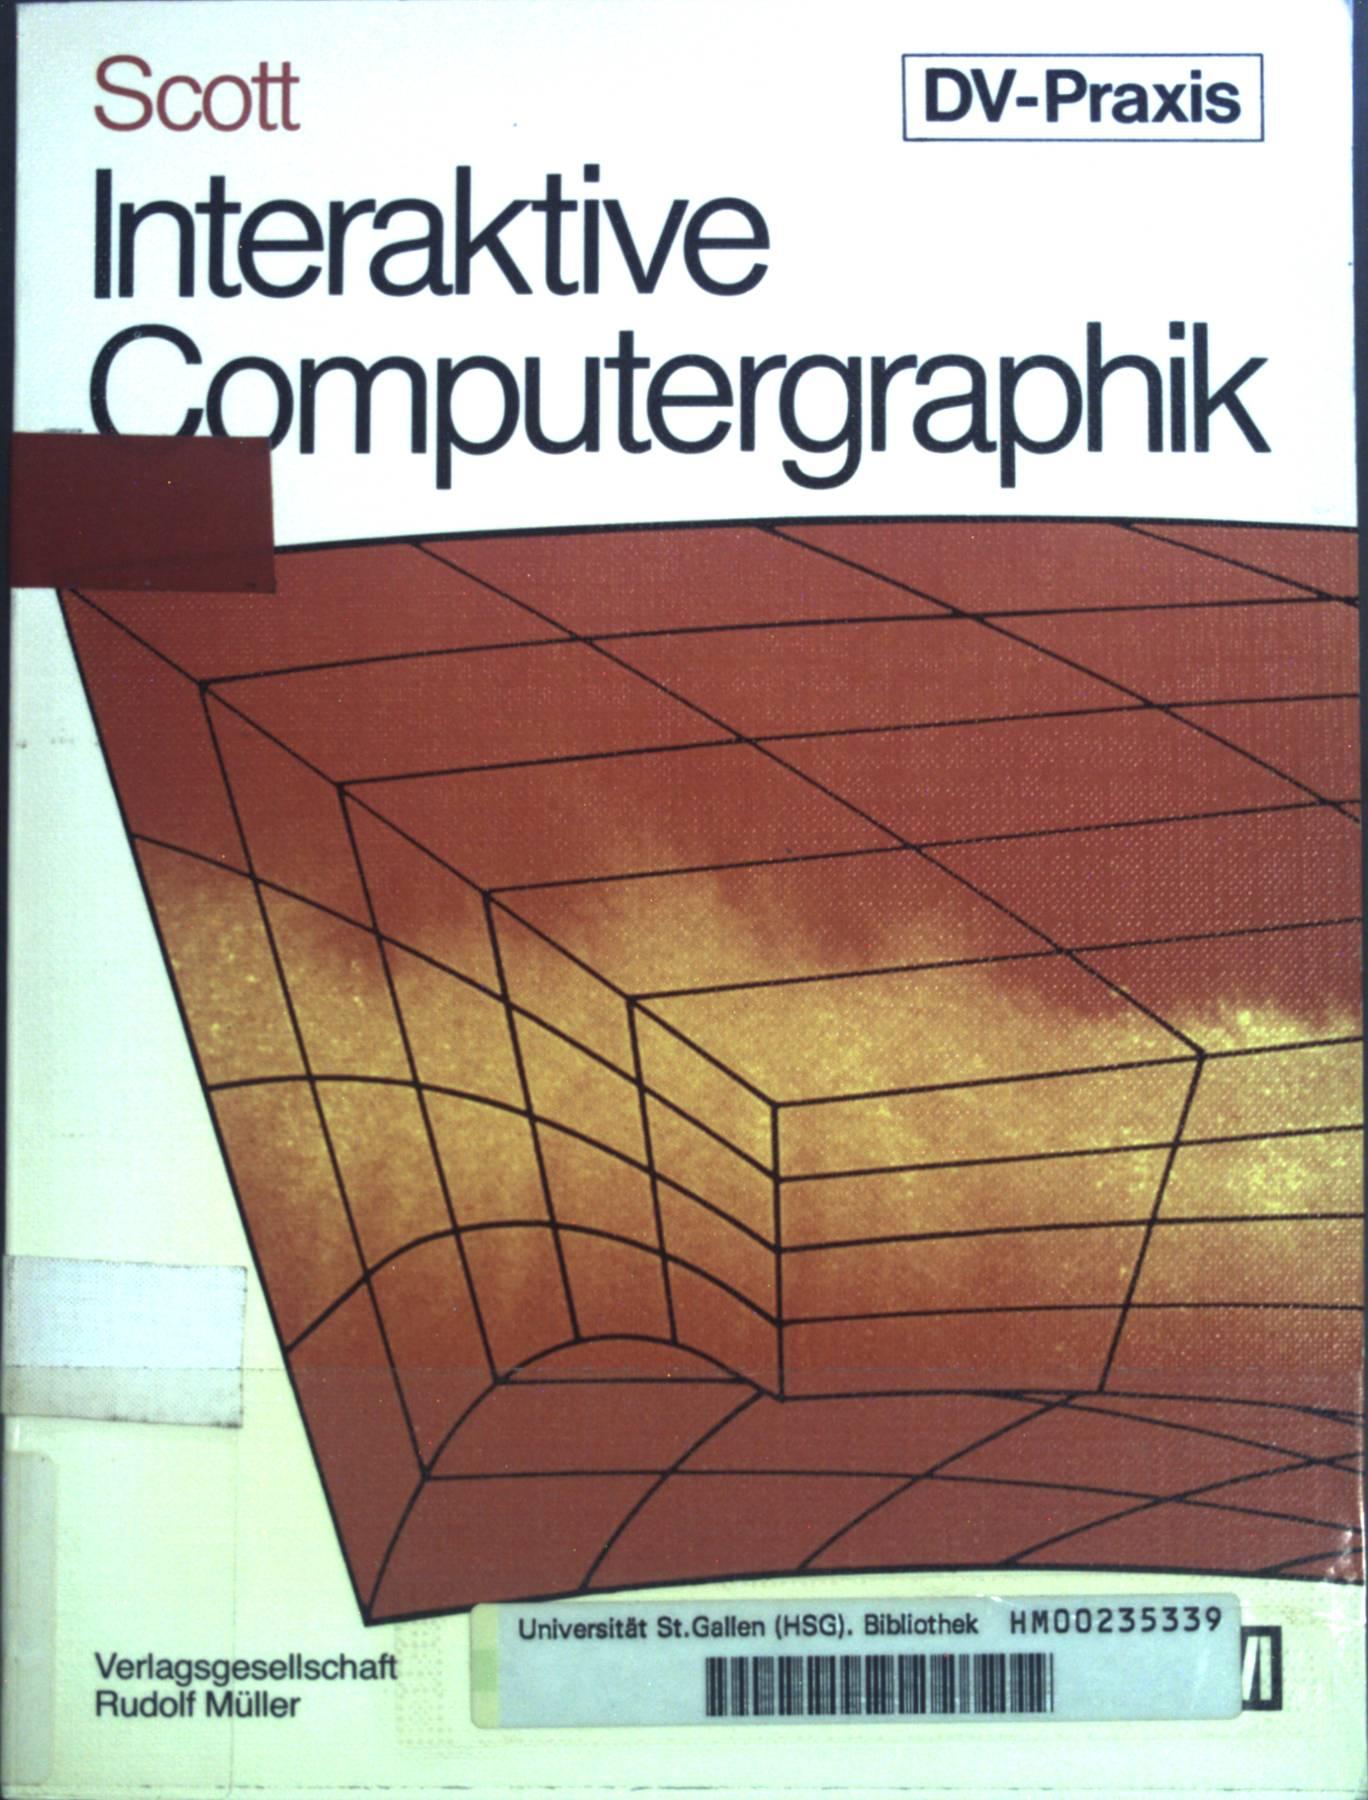 Interaktive Computergraphik. VRM-Schriftenreihe: Datenverarbeitungspraxis. - Scott, Joan E.